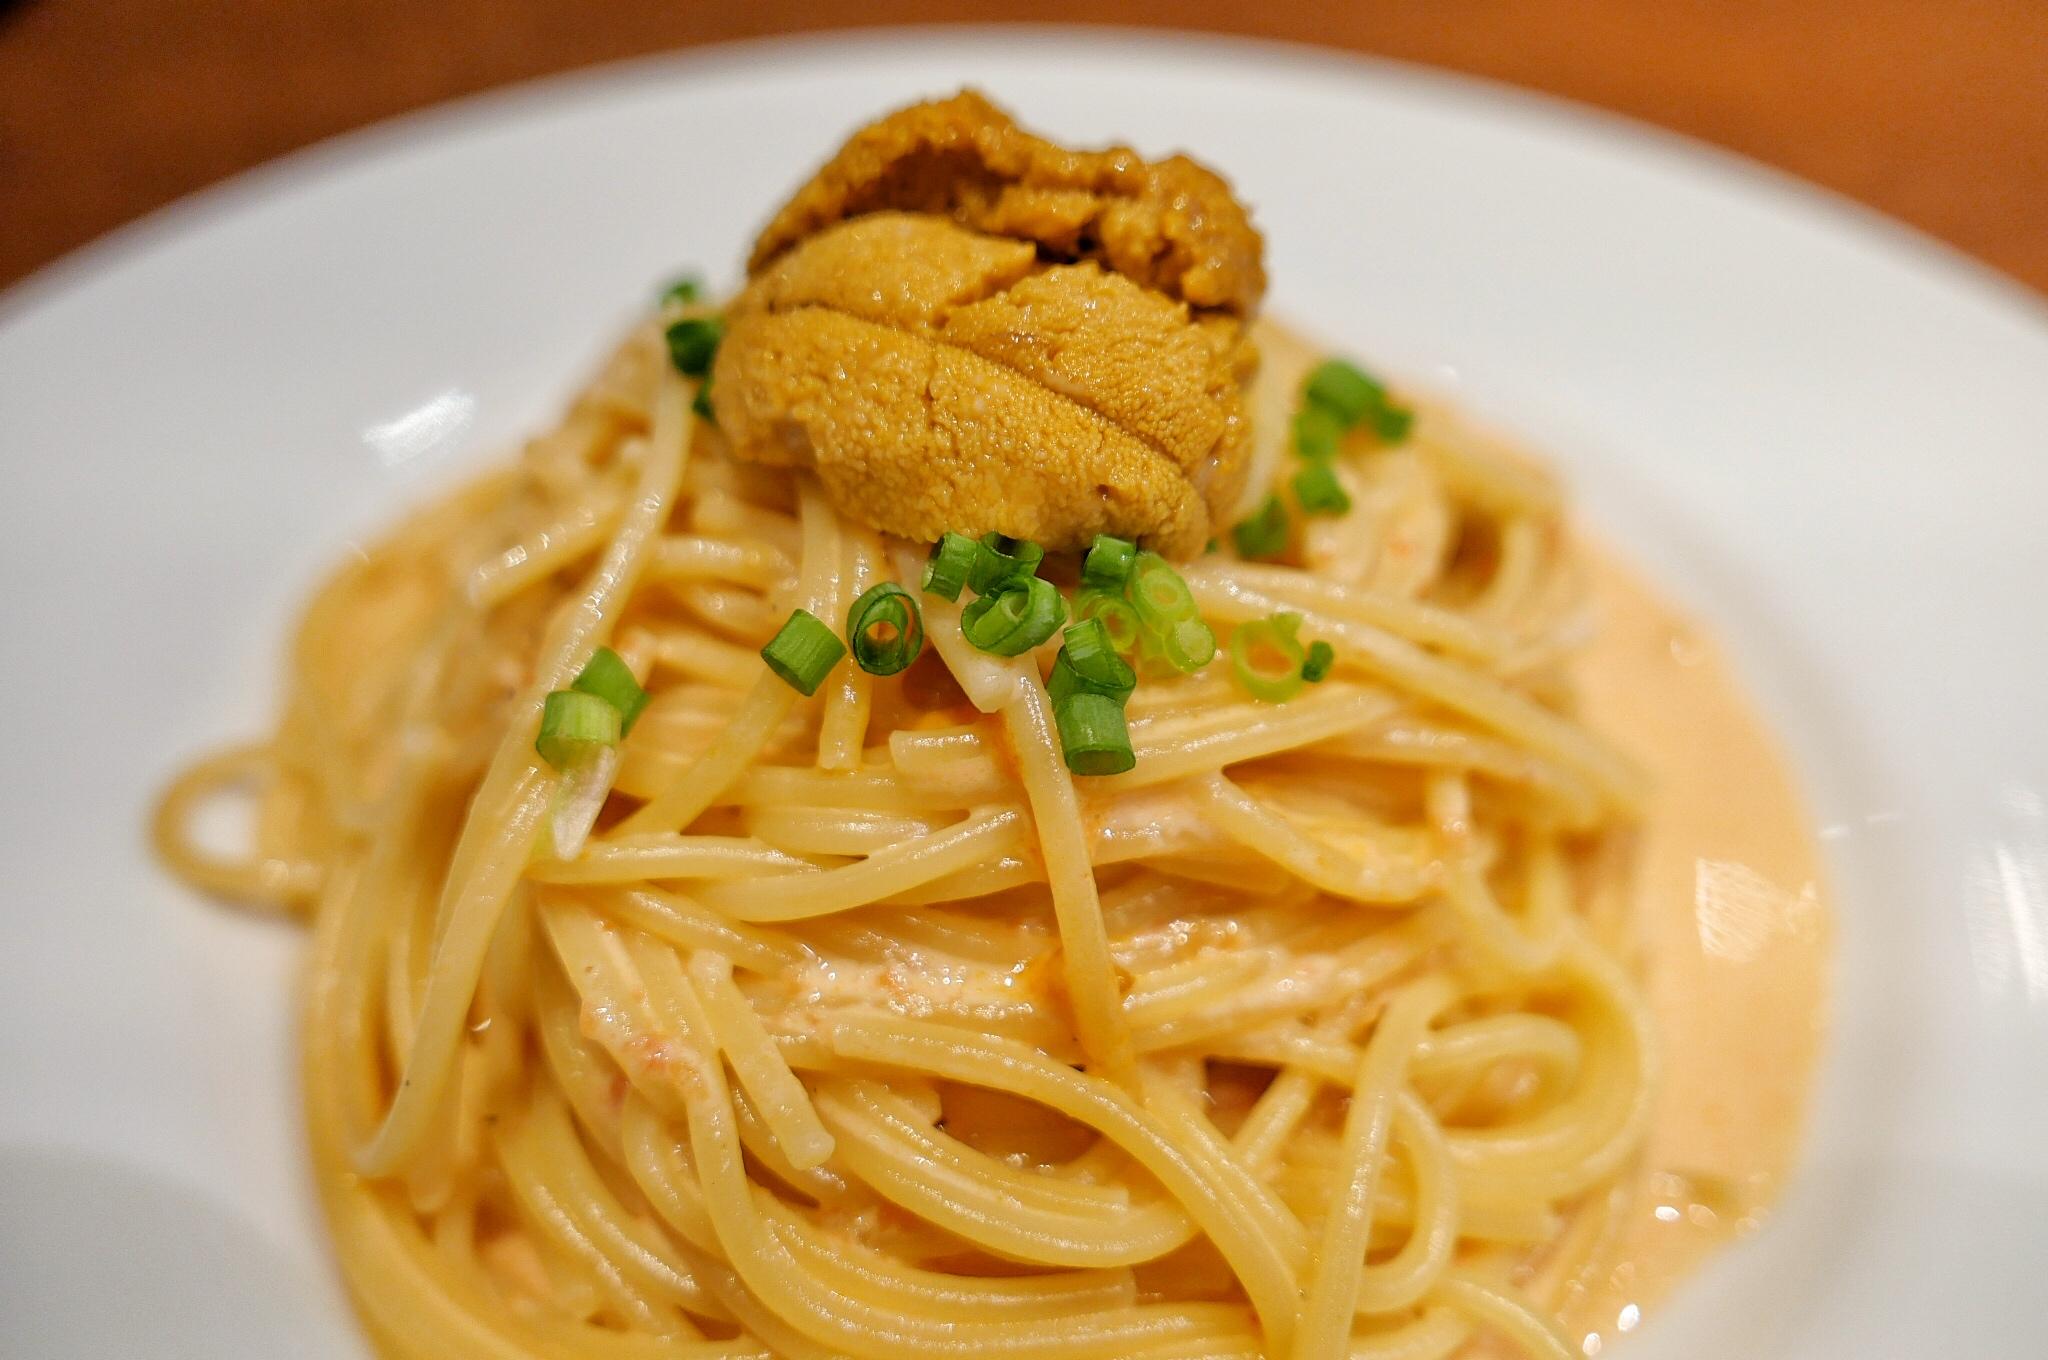 Uni pasta with green onion garnish